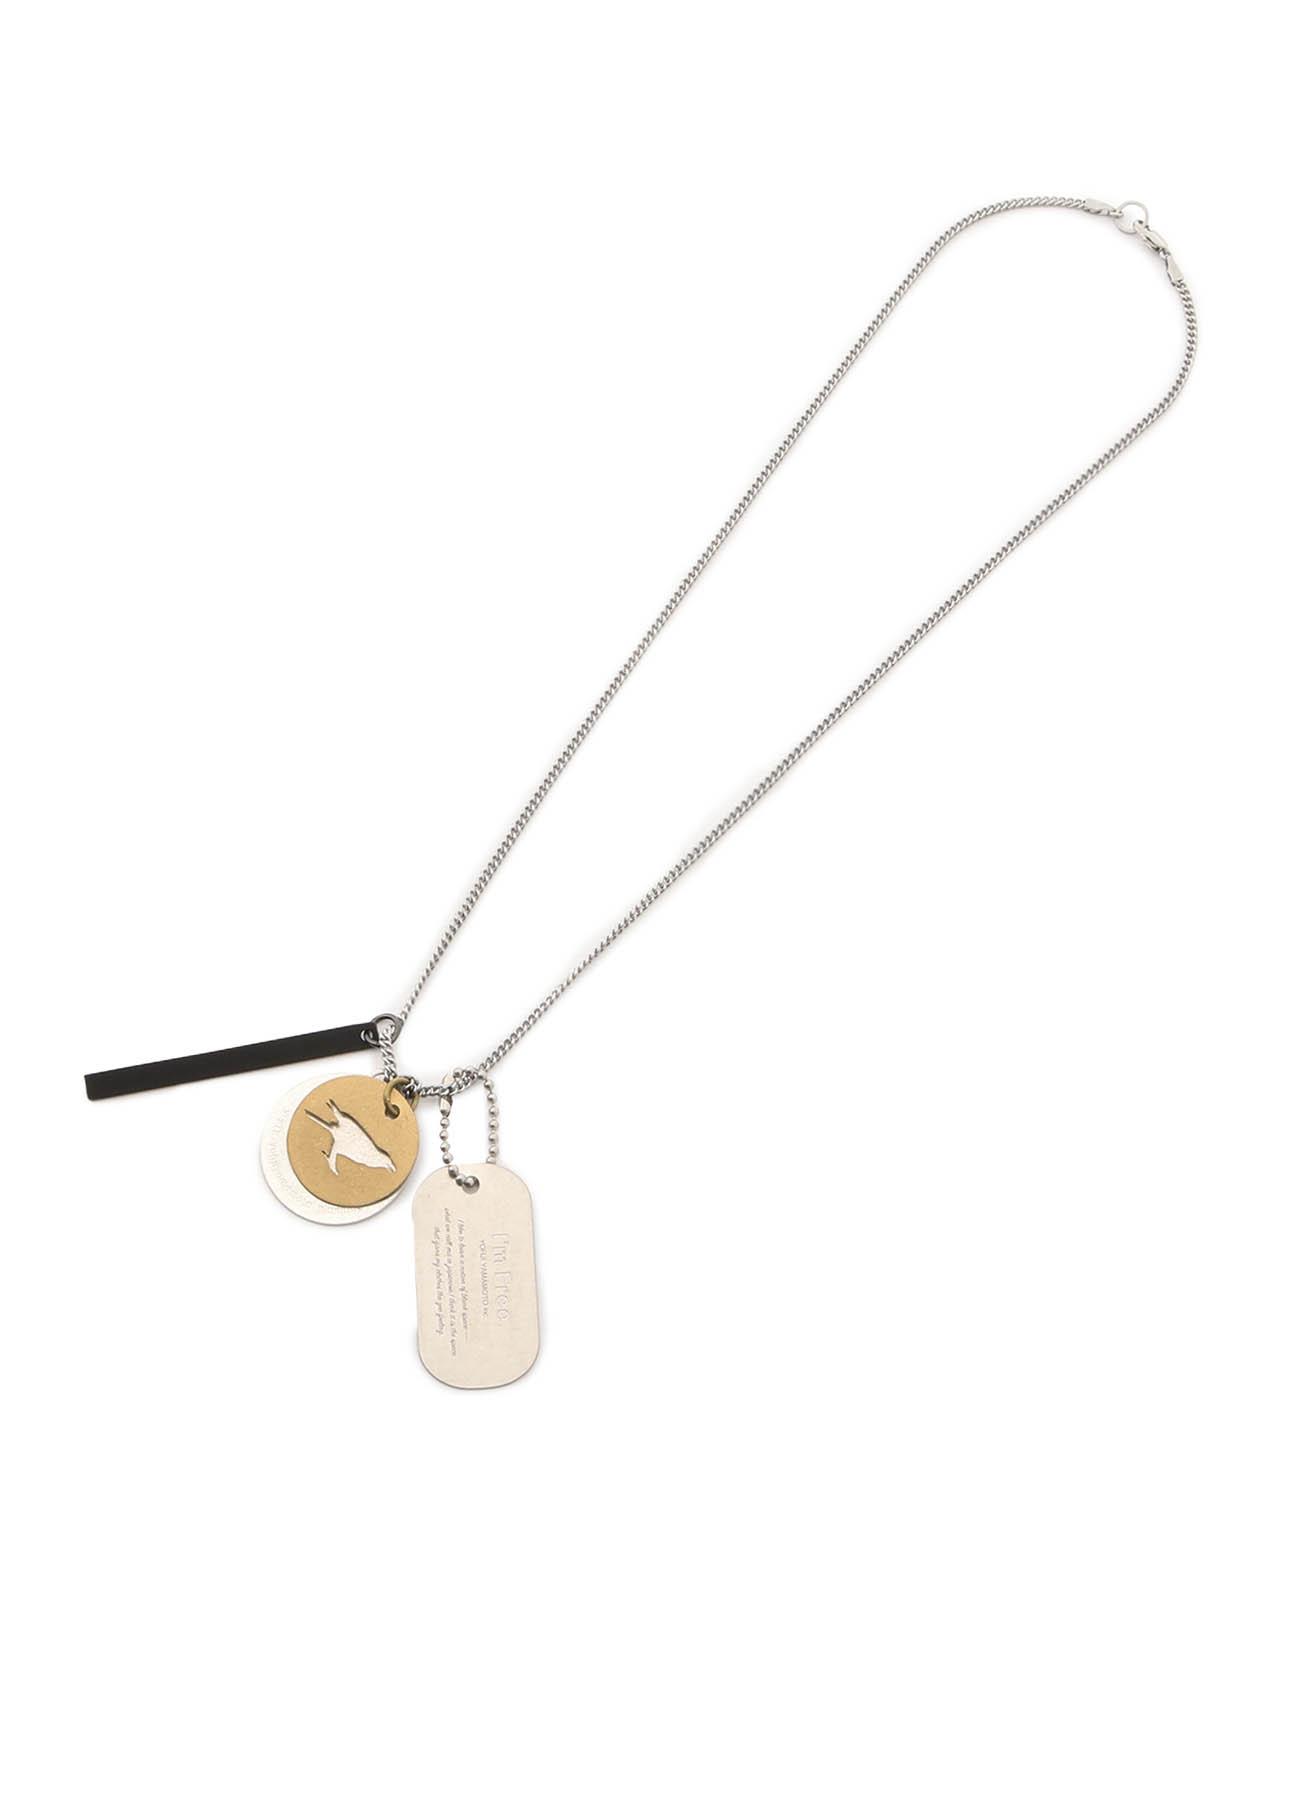 Brass Dog Tag Necklace